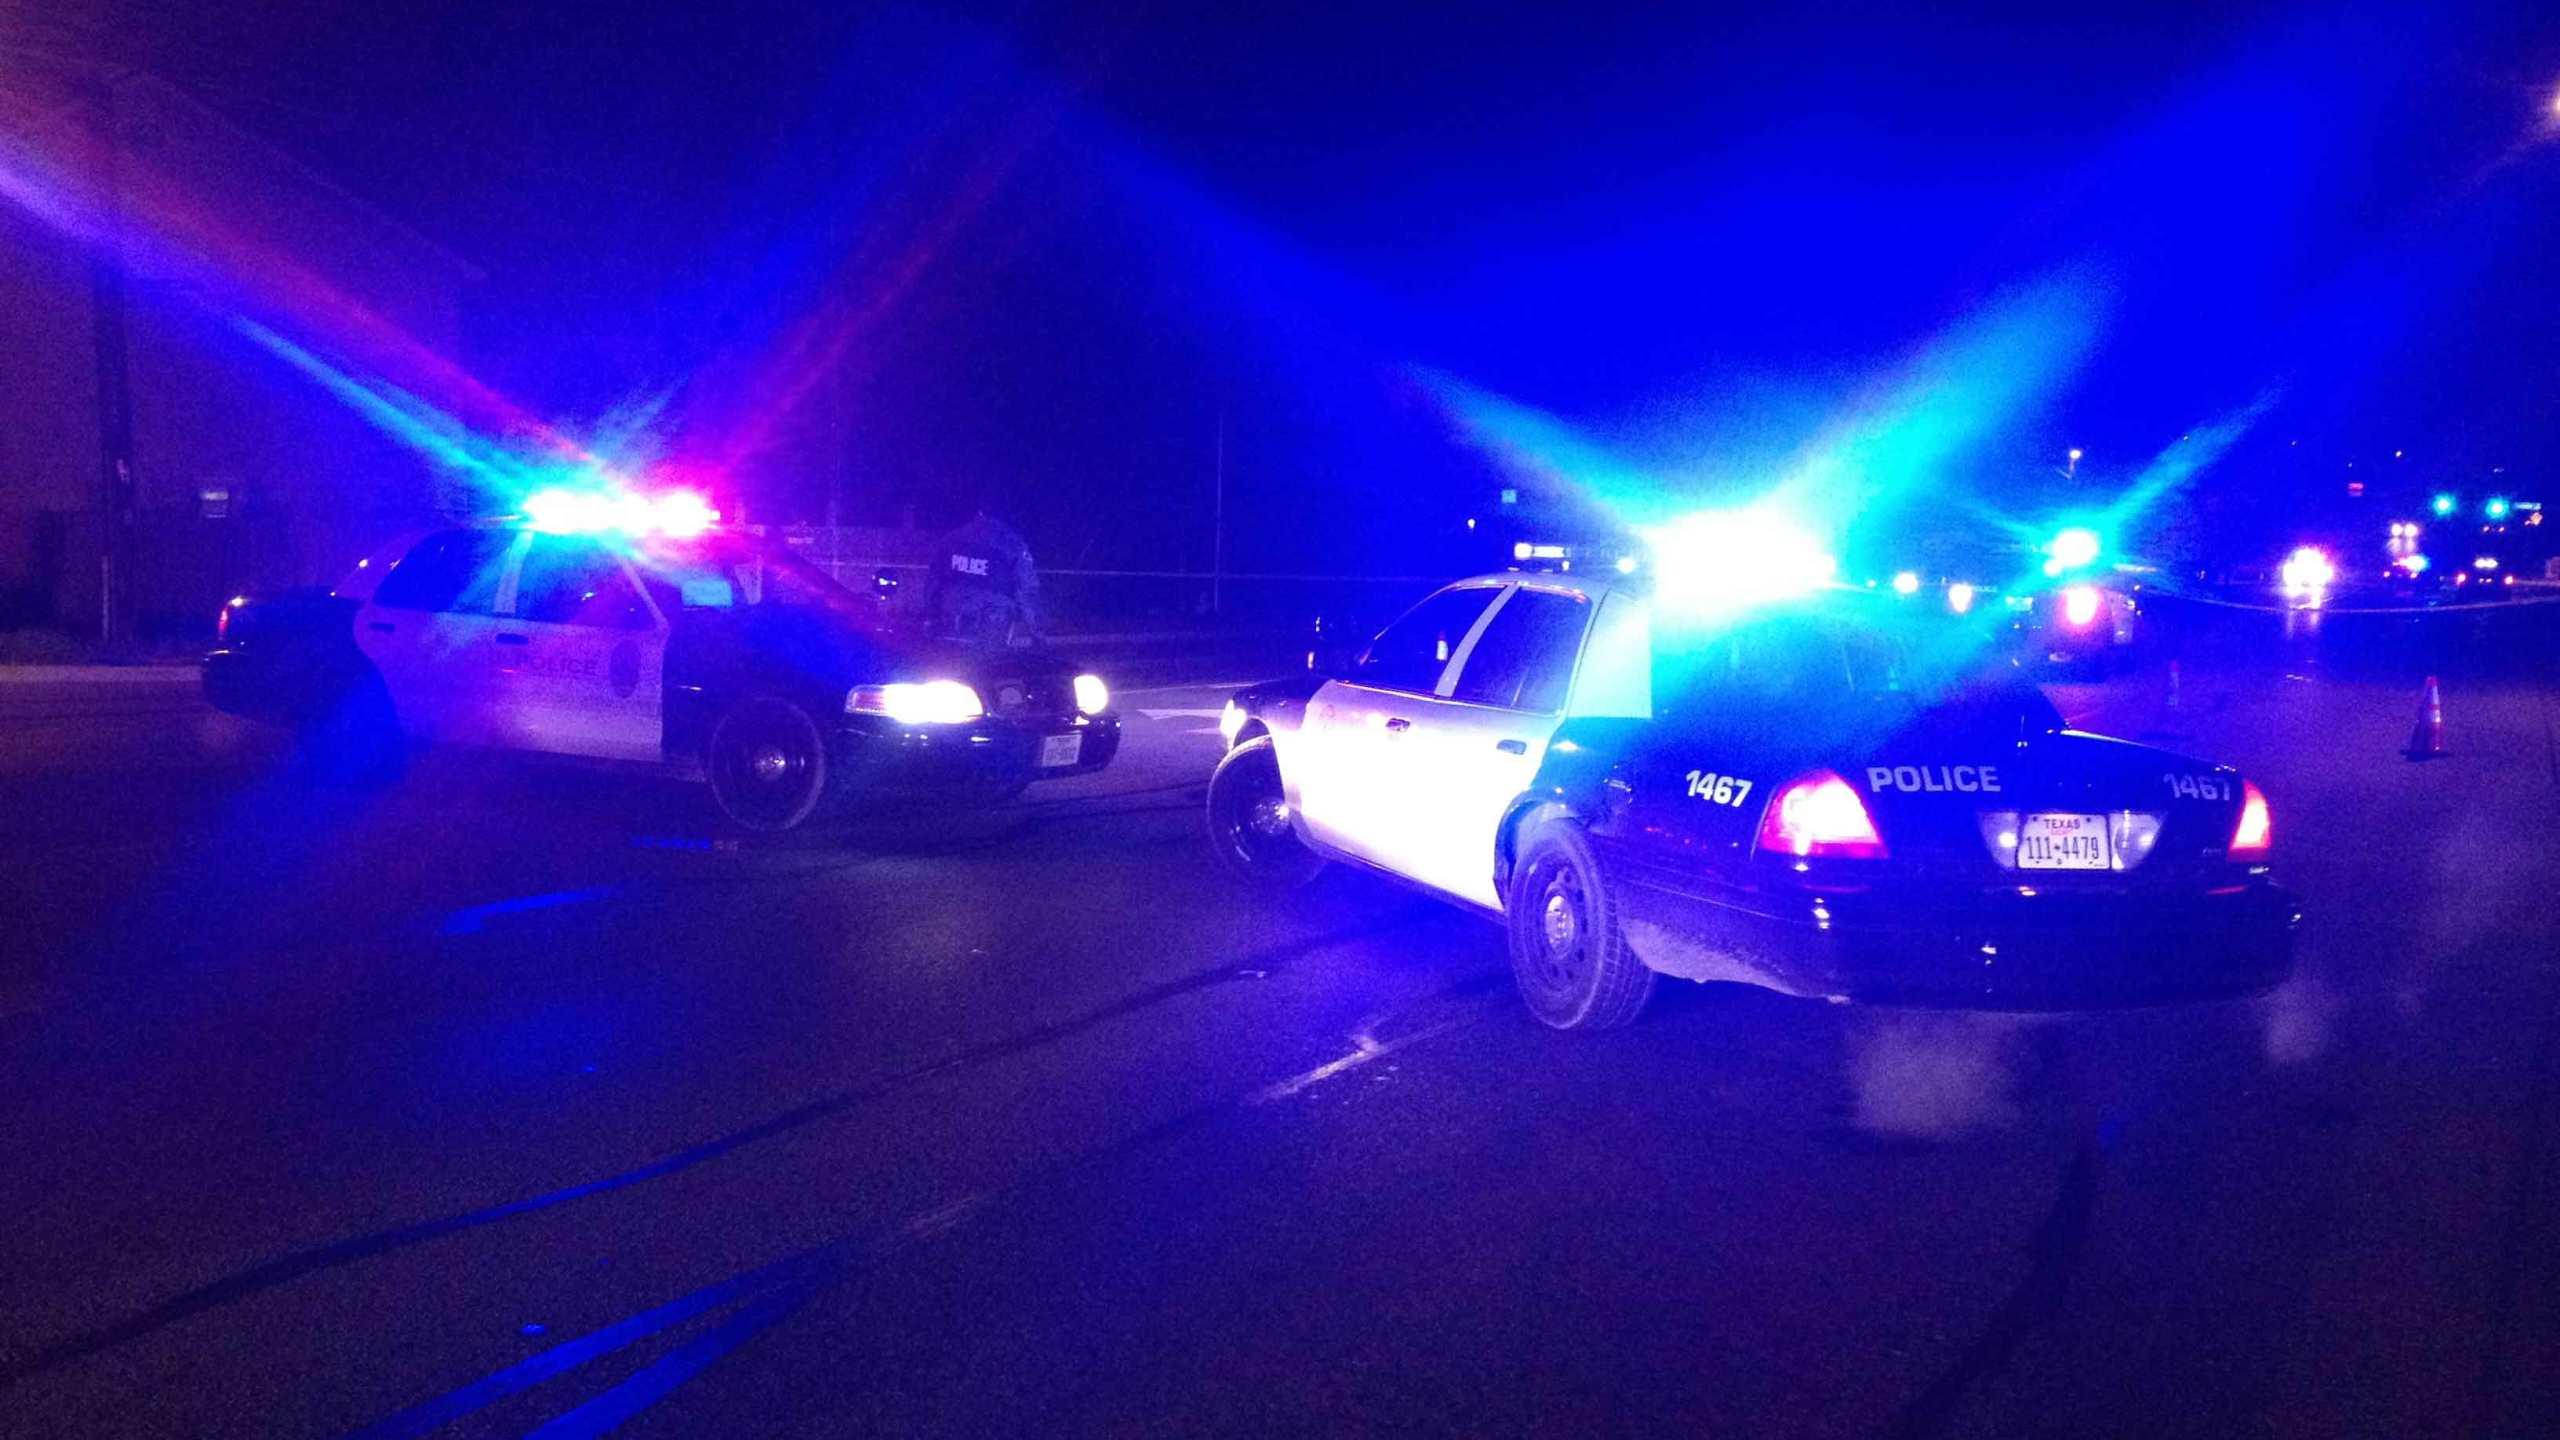 Police-lights-overnight-pol_151568